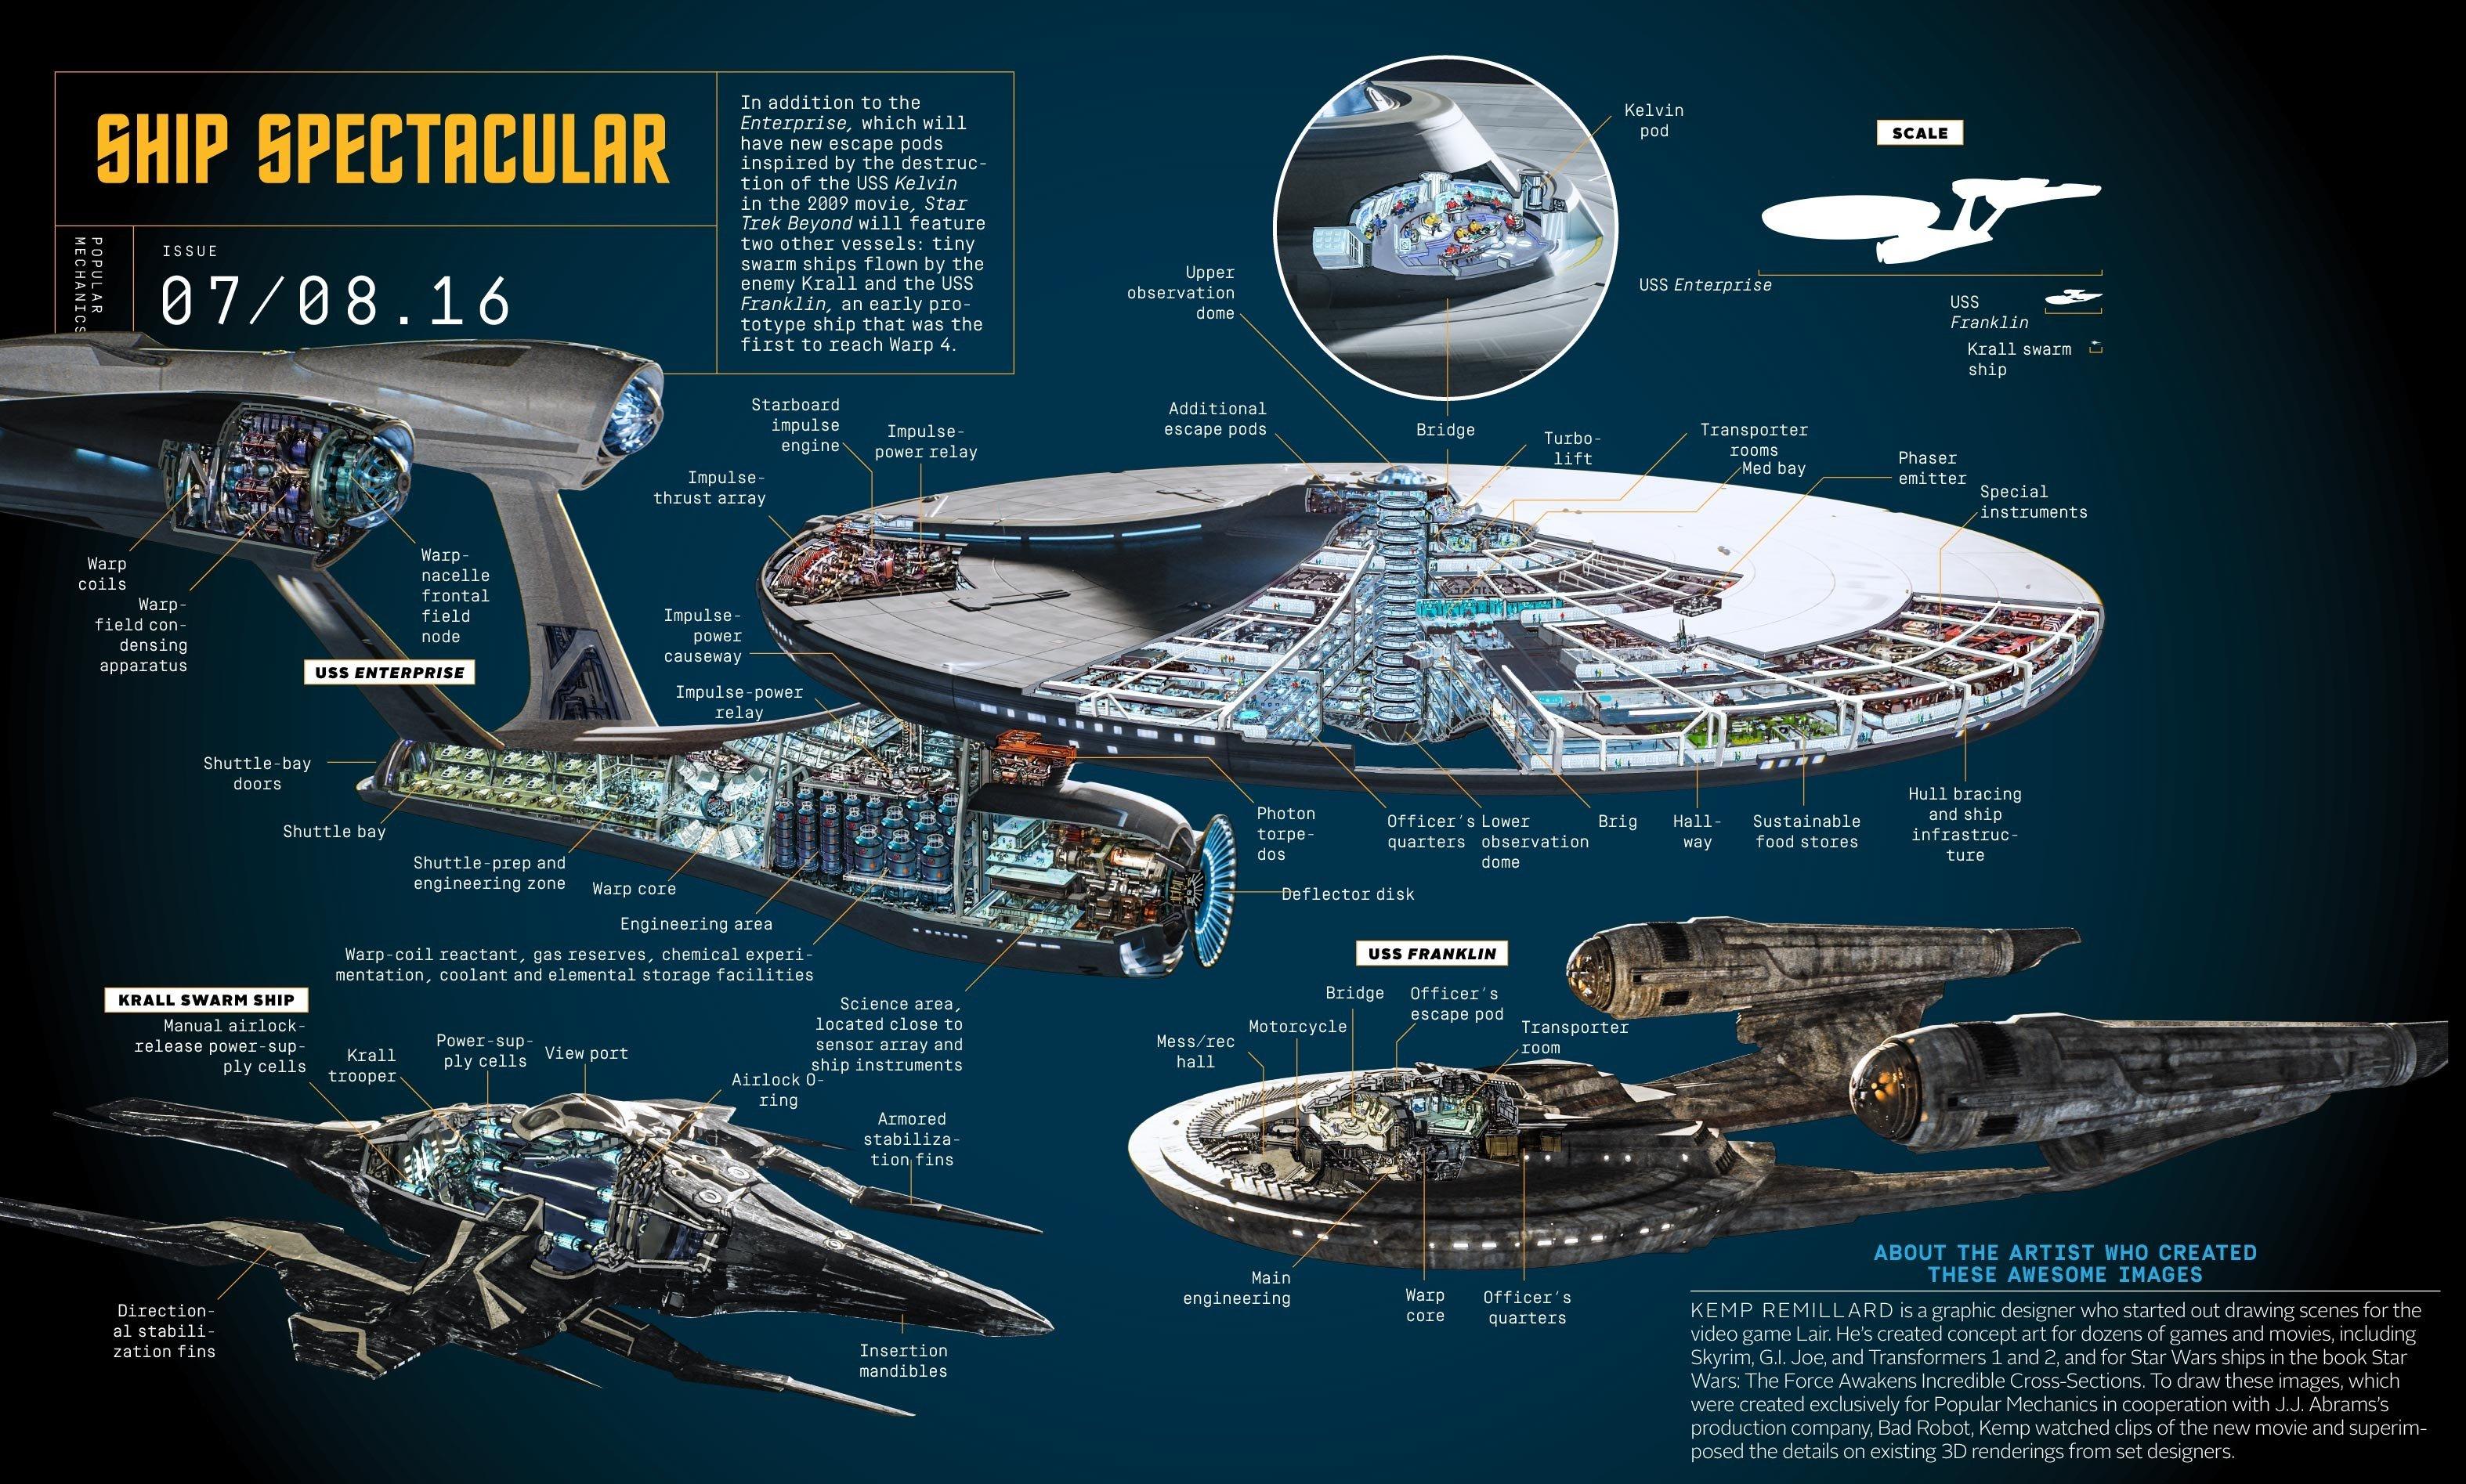 Star Trek Star Trek Enterprise Hd Wallpapers Desktop And